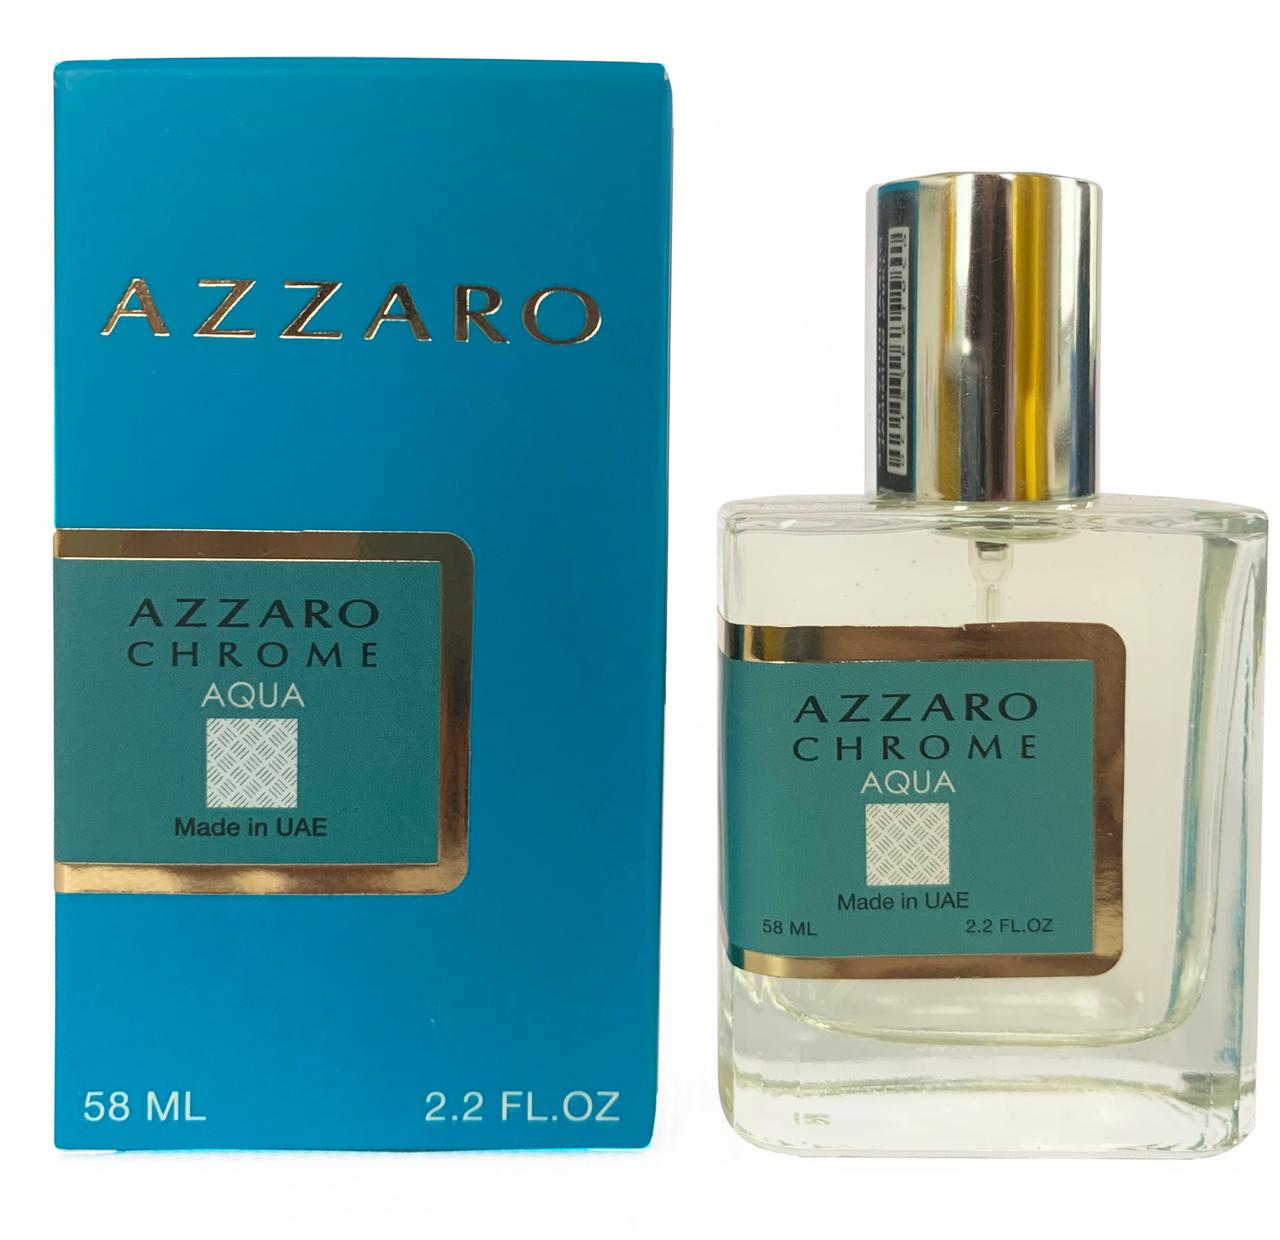 Azzaro Chrome Aqua Perfume Newly мужской, 58 мл